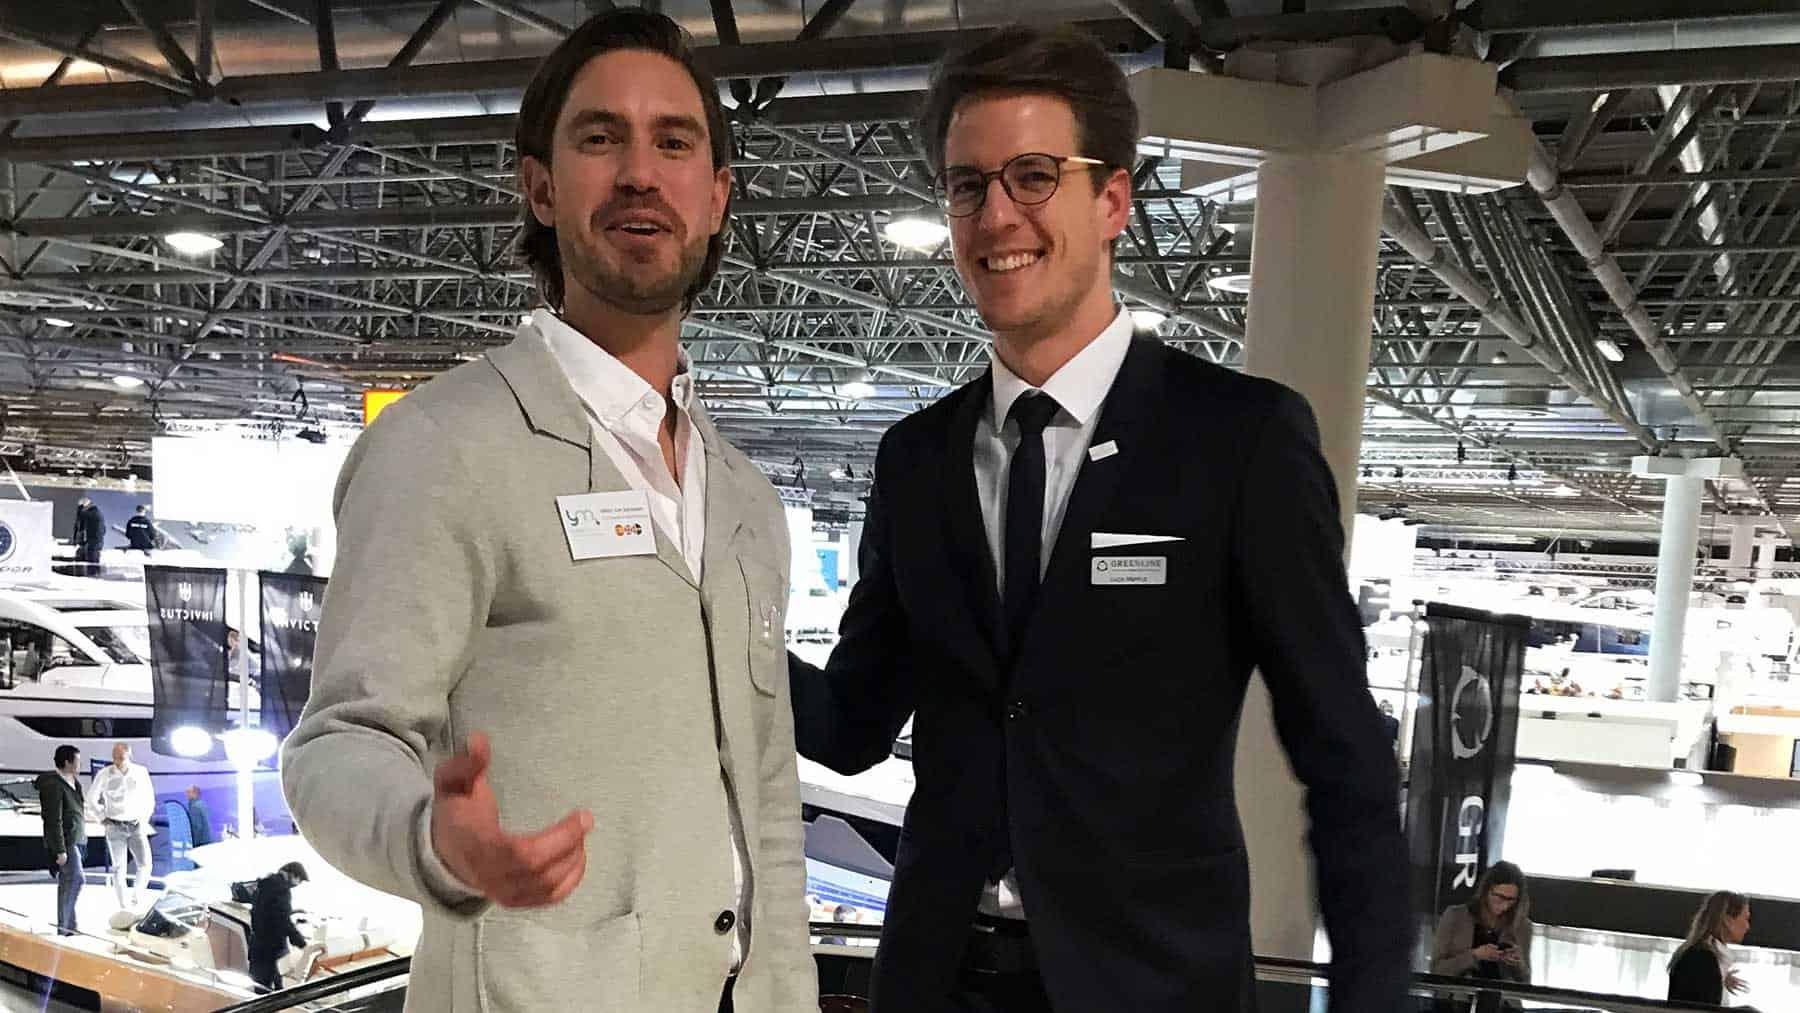 Dusseldorf-Viktor-and-Partner-Yacht-Match